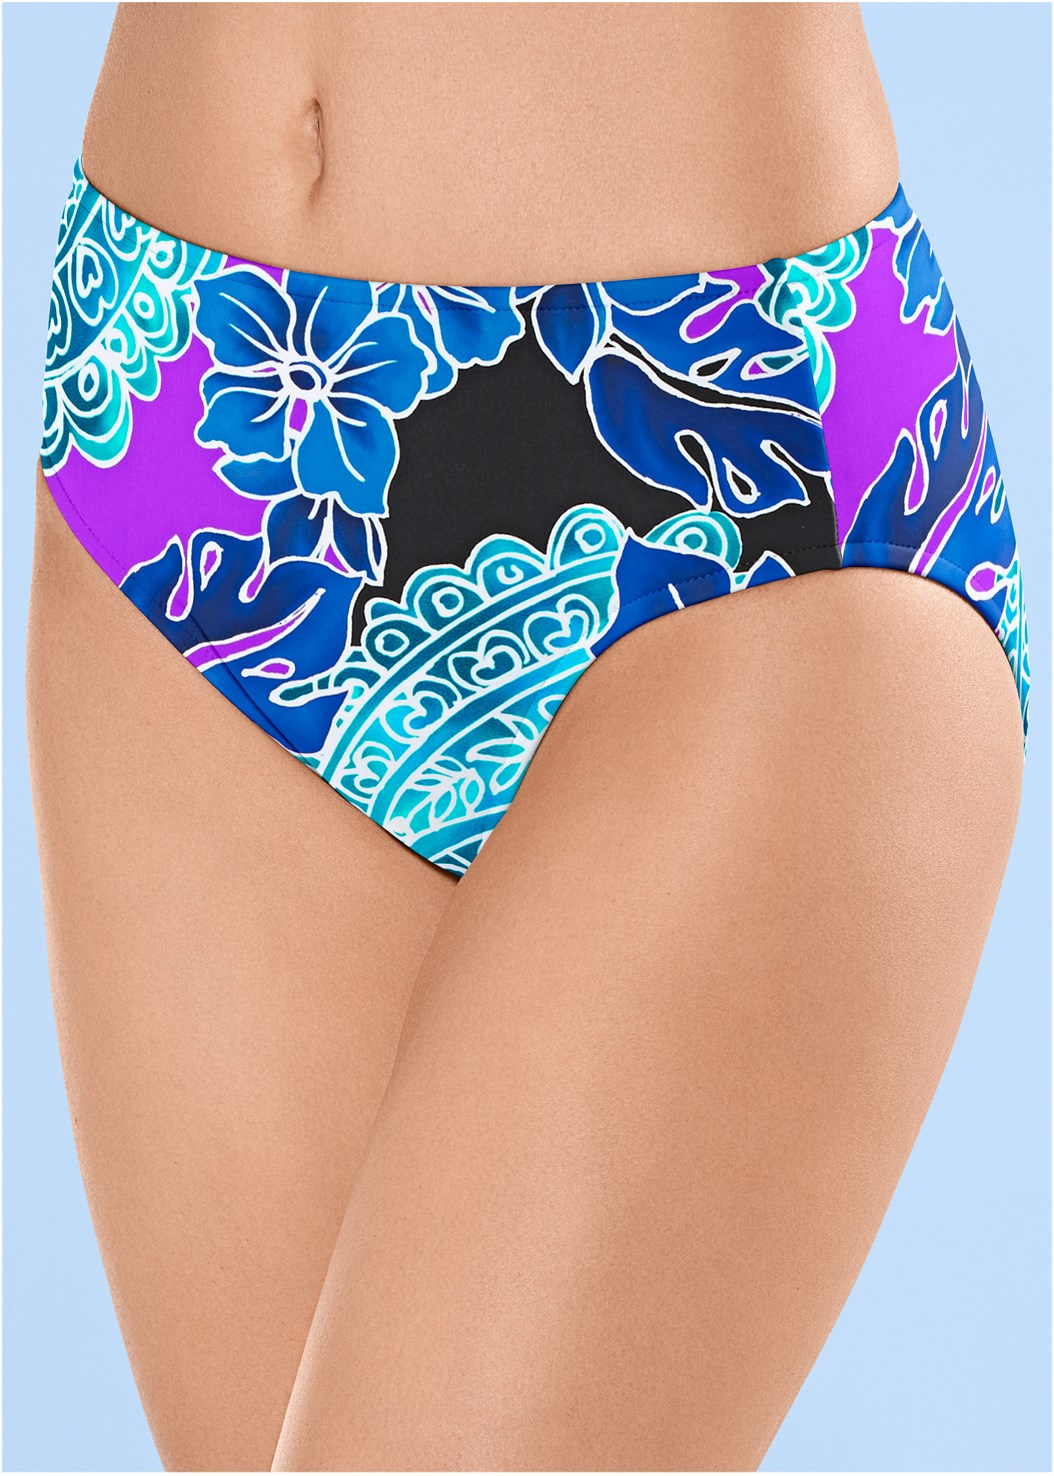 Full Coverage Mid Rise Hipster Bikini Bottom,Blouson Bandeau Bikini Top,Mid Rise Hipster Classic Bikini Bottom,Underwire Halter Bikini Top